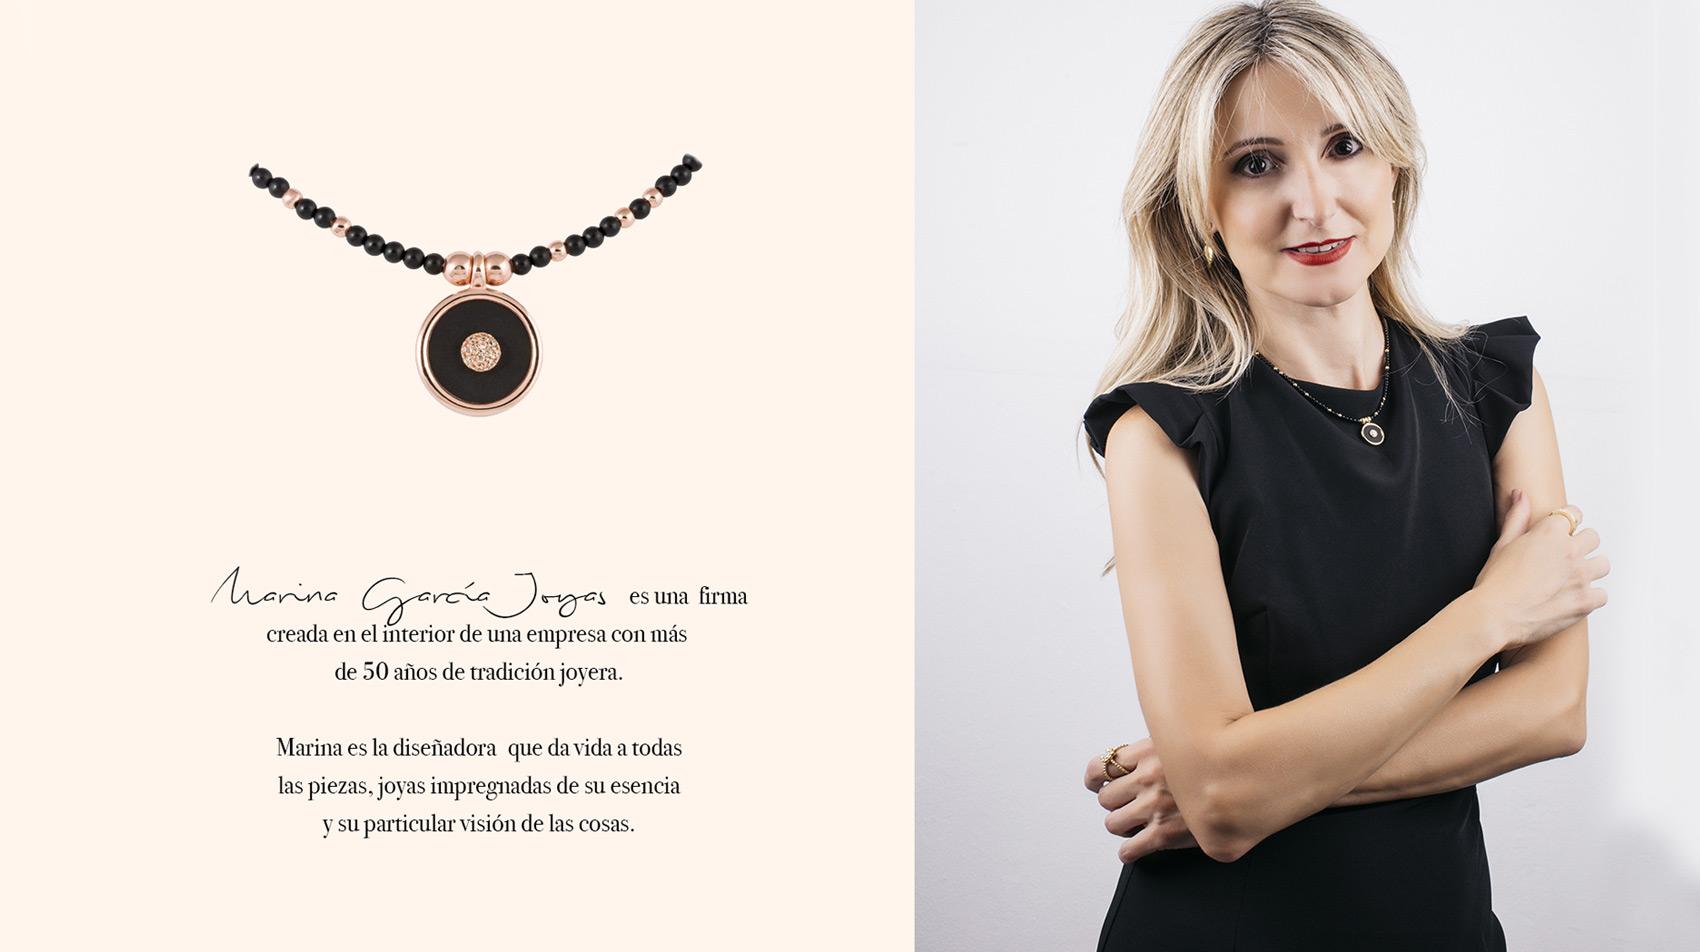 donde comprar joyas marina garcia online marga mira joyeria online mejores joyerias españa